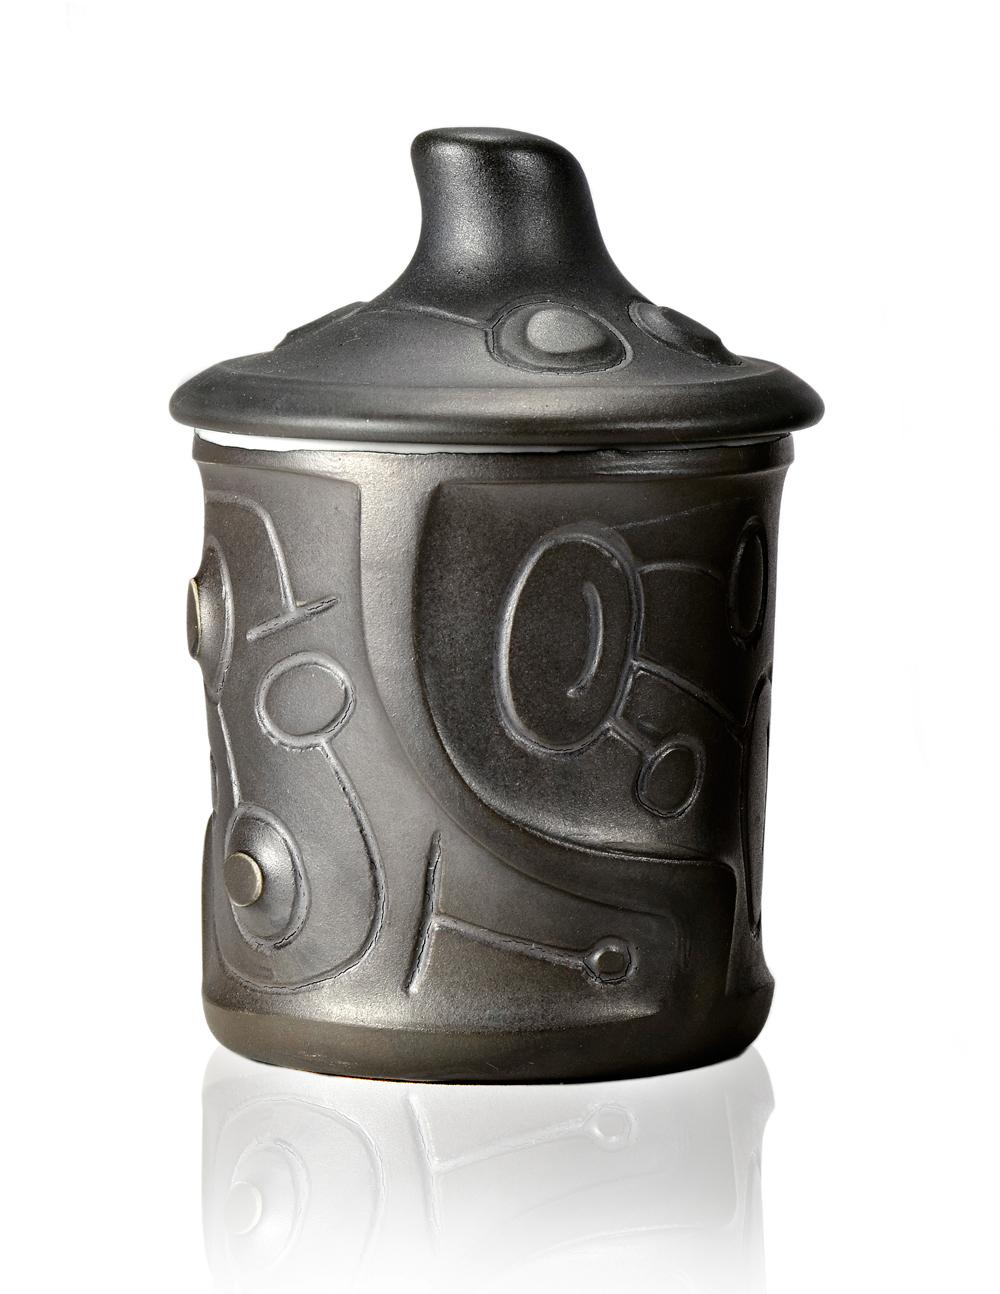 2-ryan-mckerley-ceramic-artist